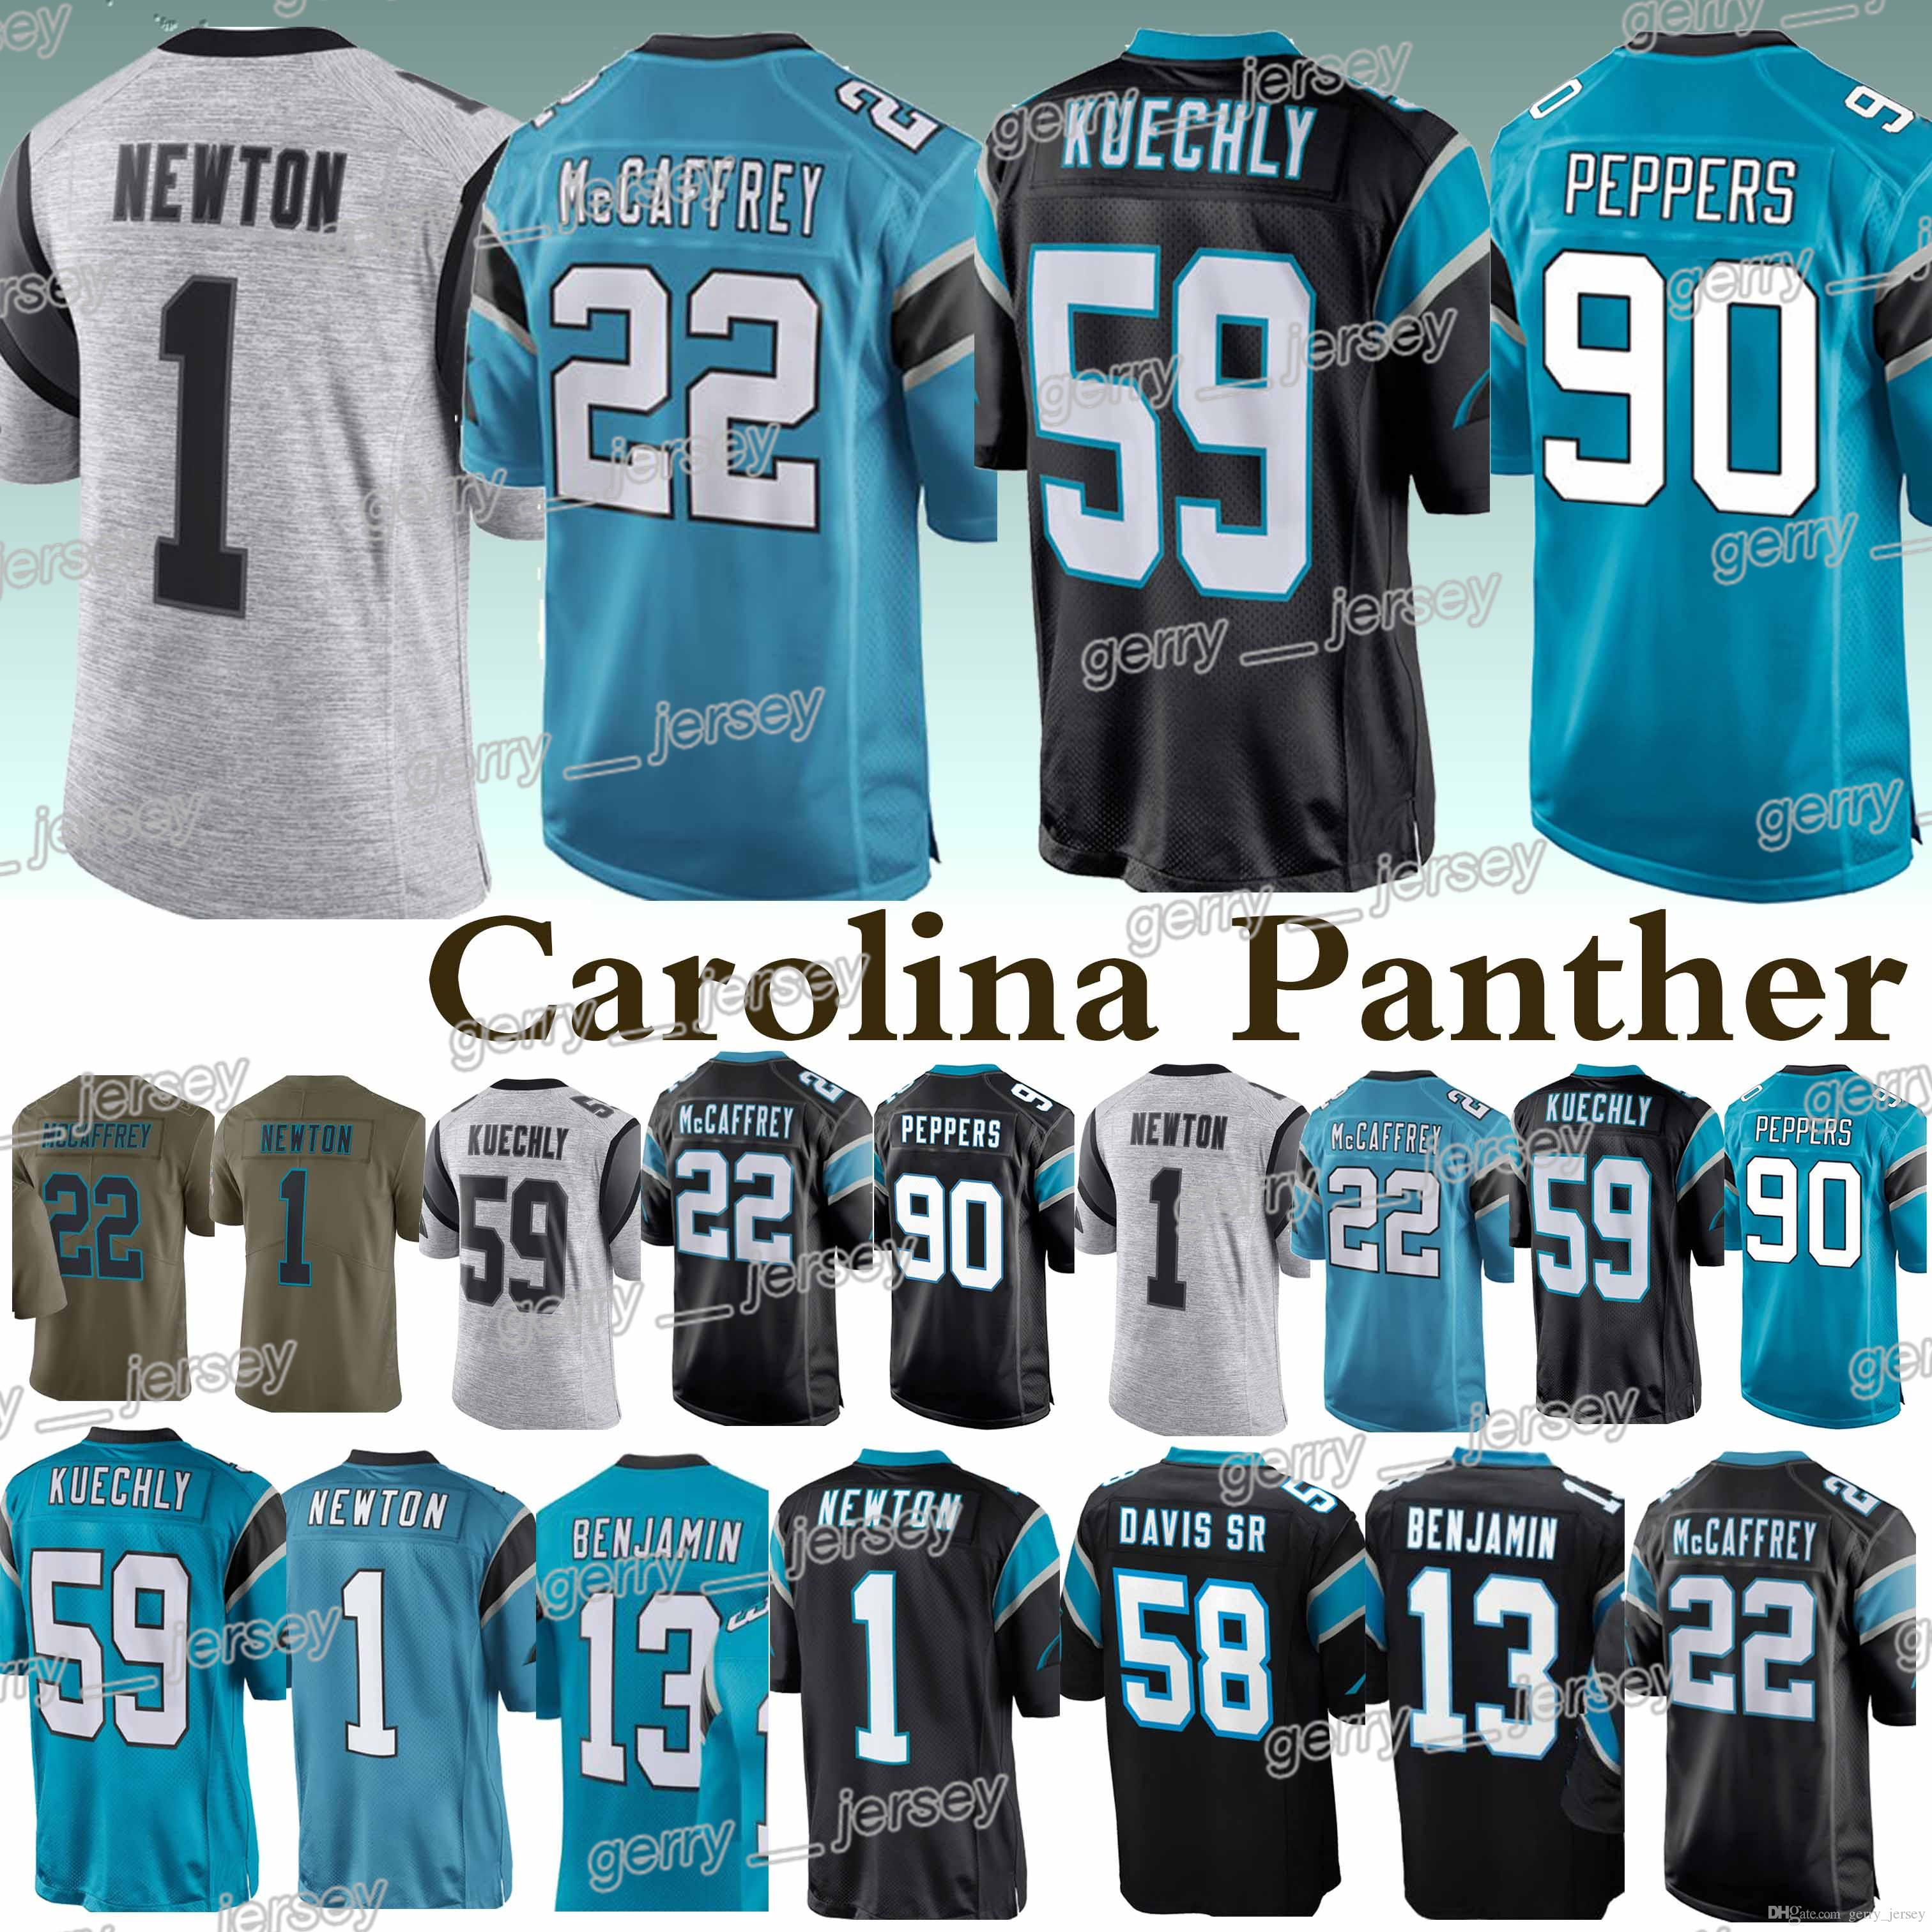 ... promo code for 2019 carolina panther jerseys 59 luke kuechly 22  christian mccaffrey 58 thomas davis 0161a1ae3